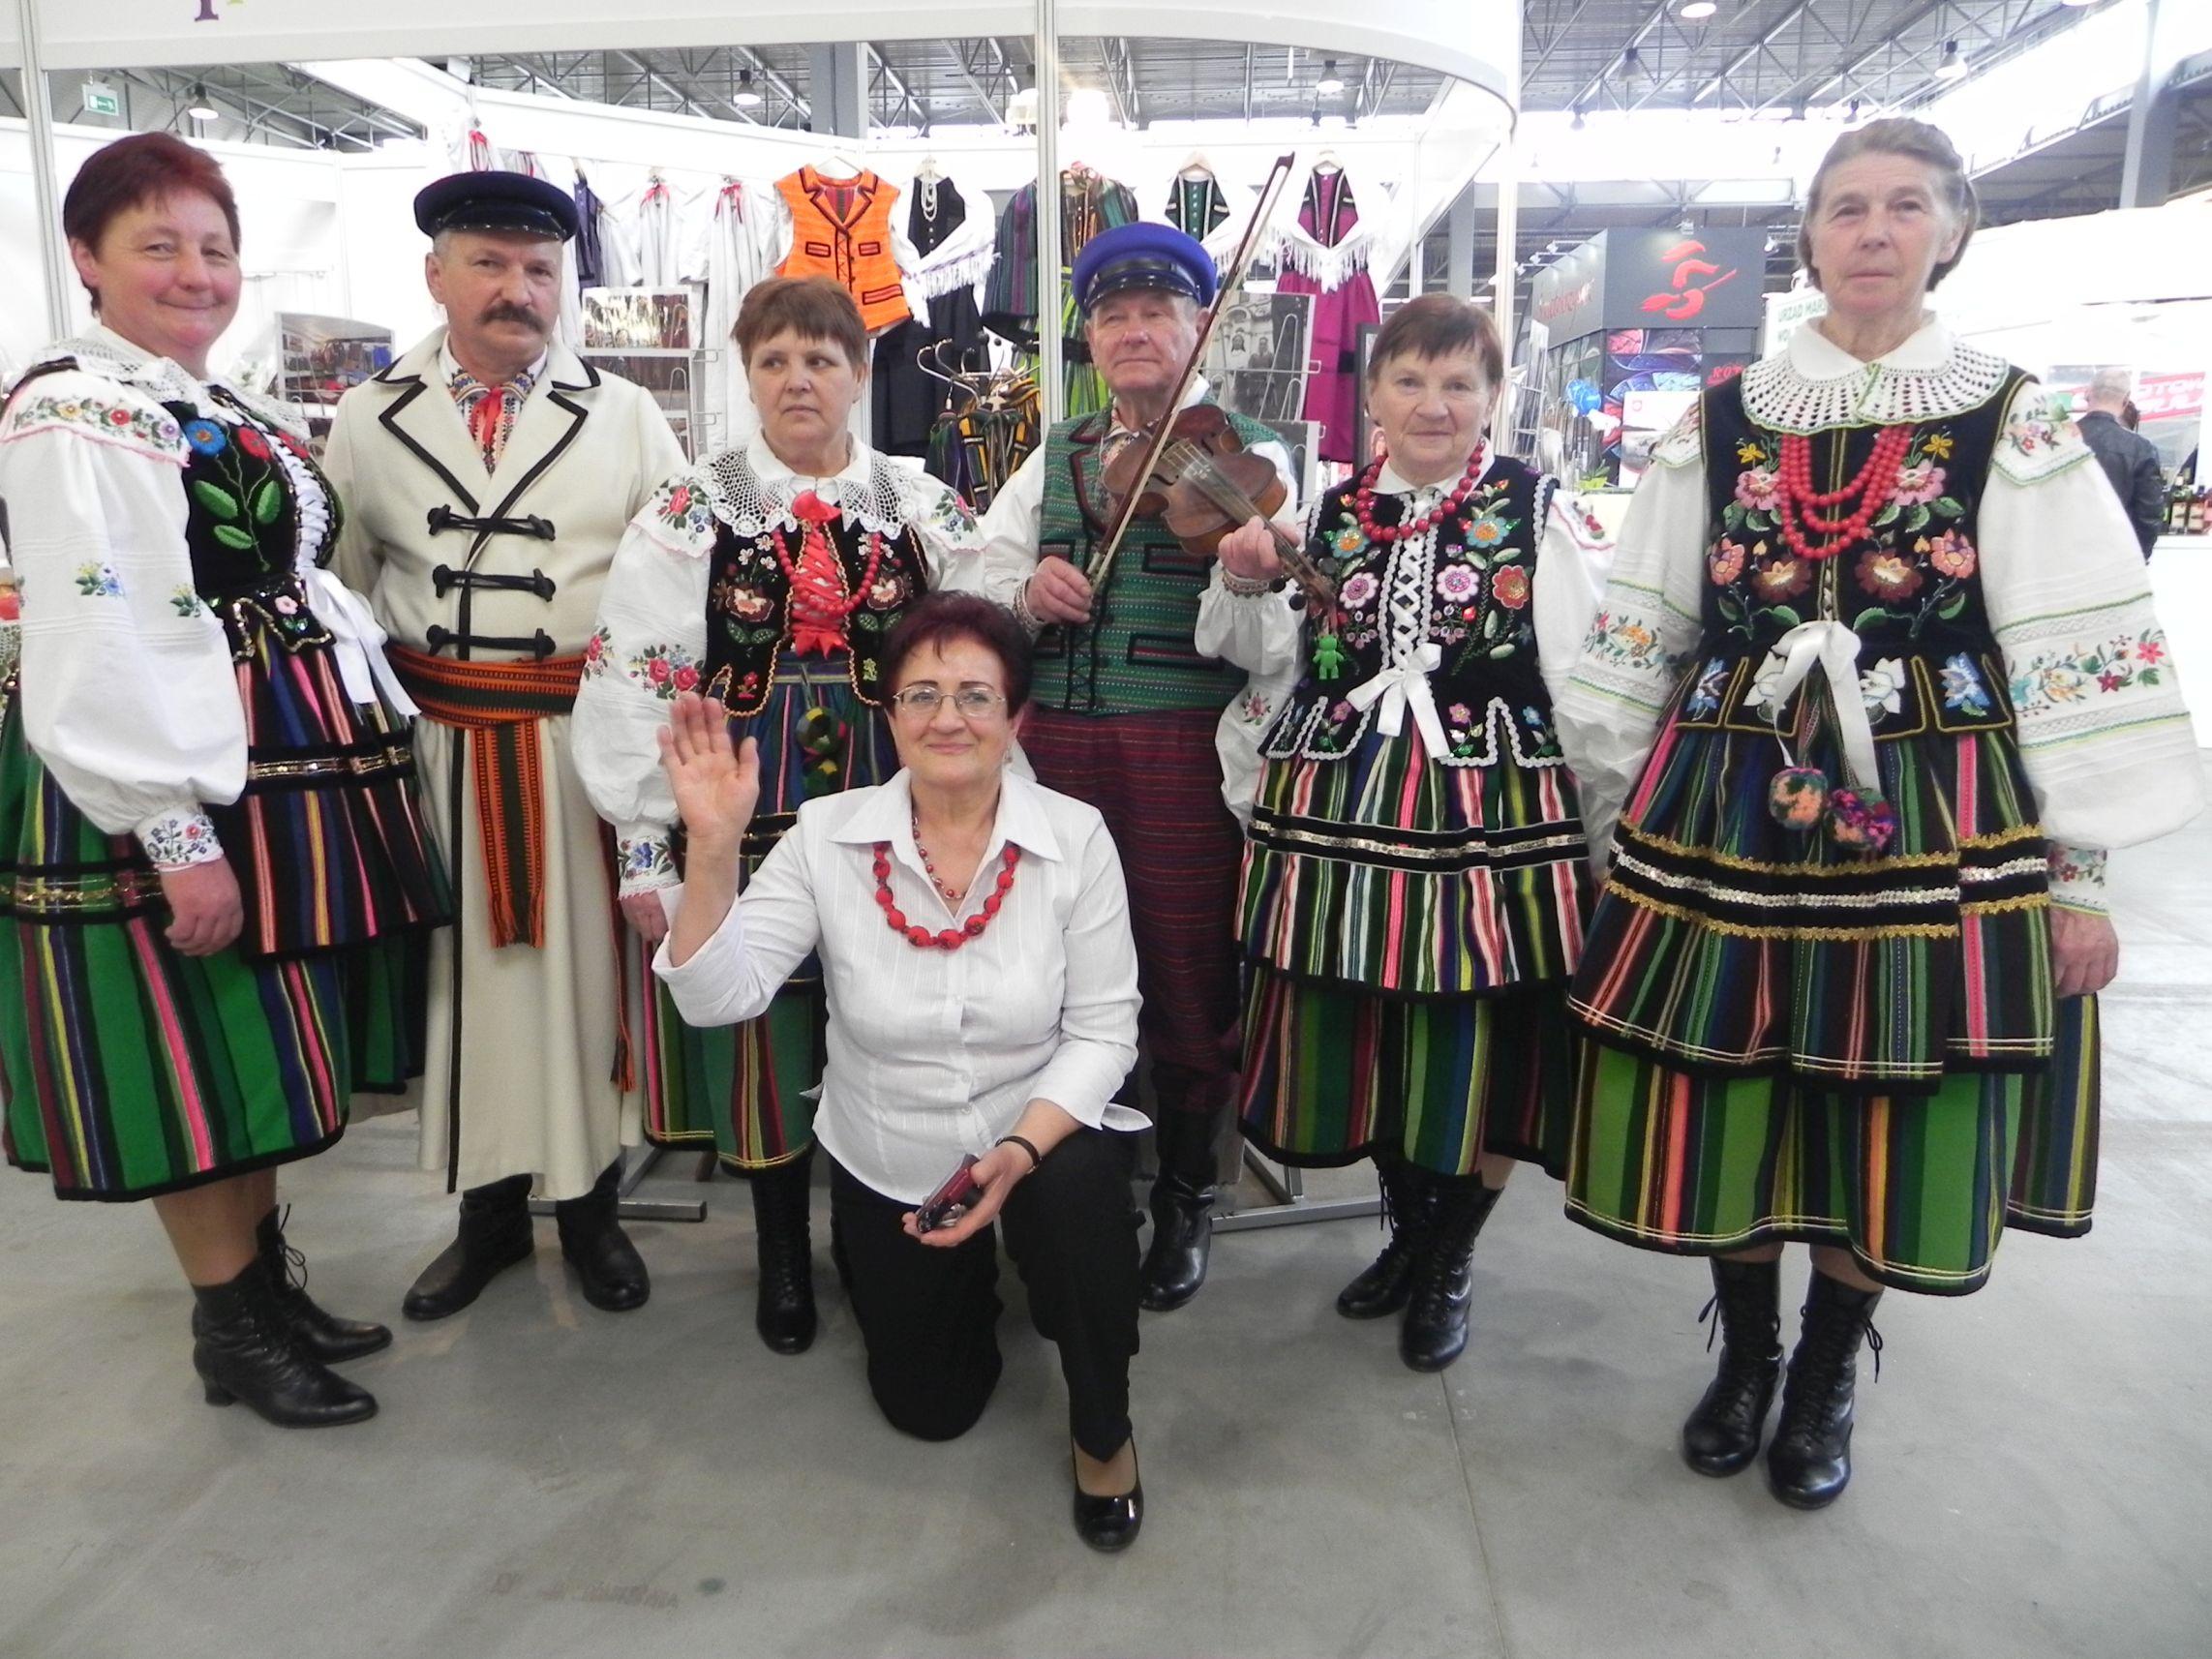 Agrotravel - Kielce (65)